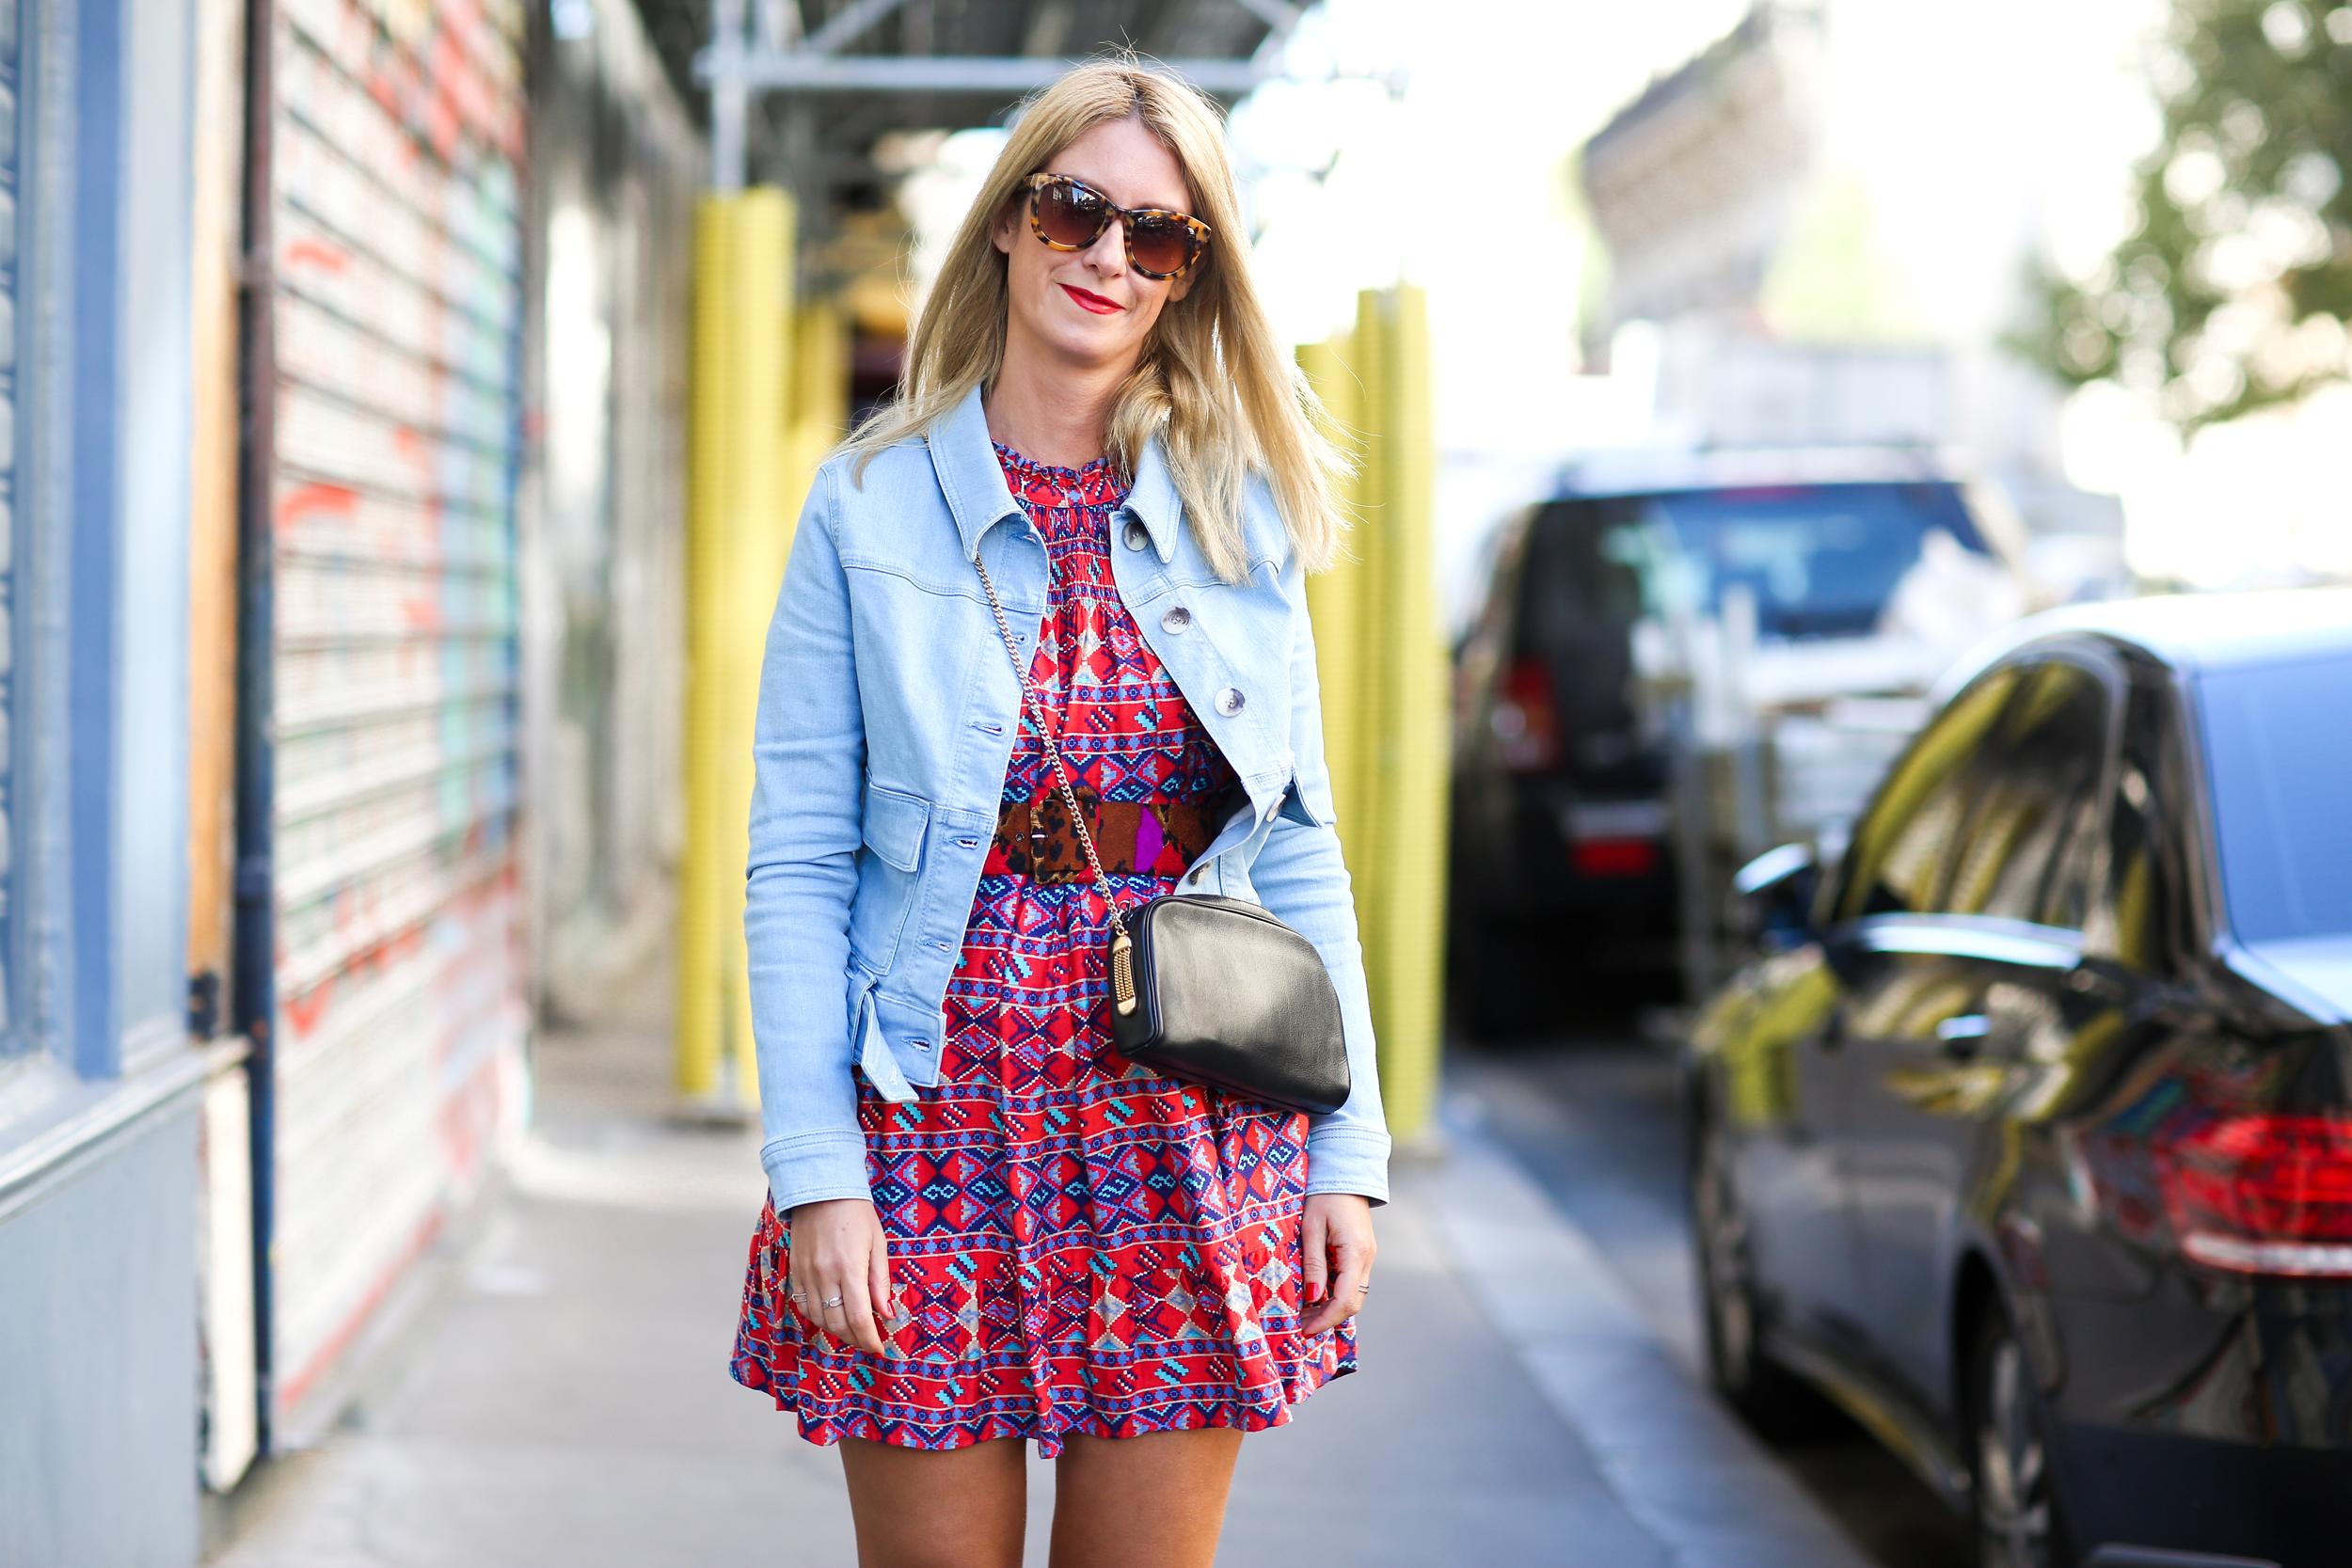 Vintage-dress-and-Jeans-jacket